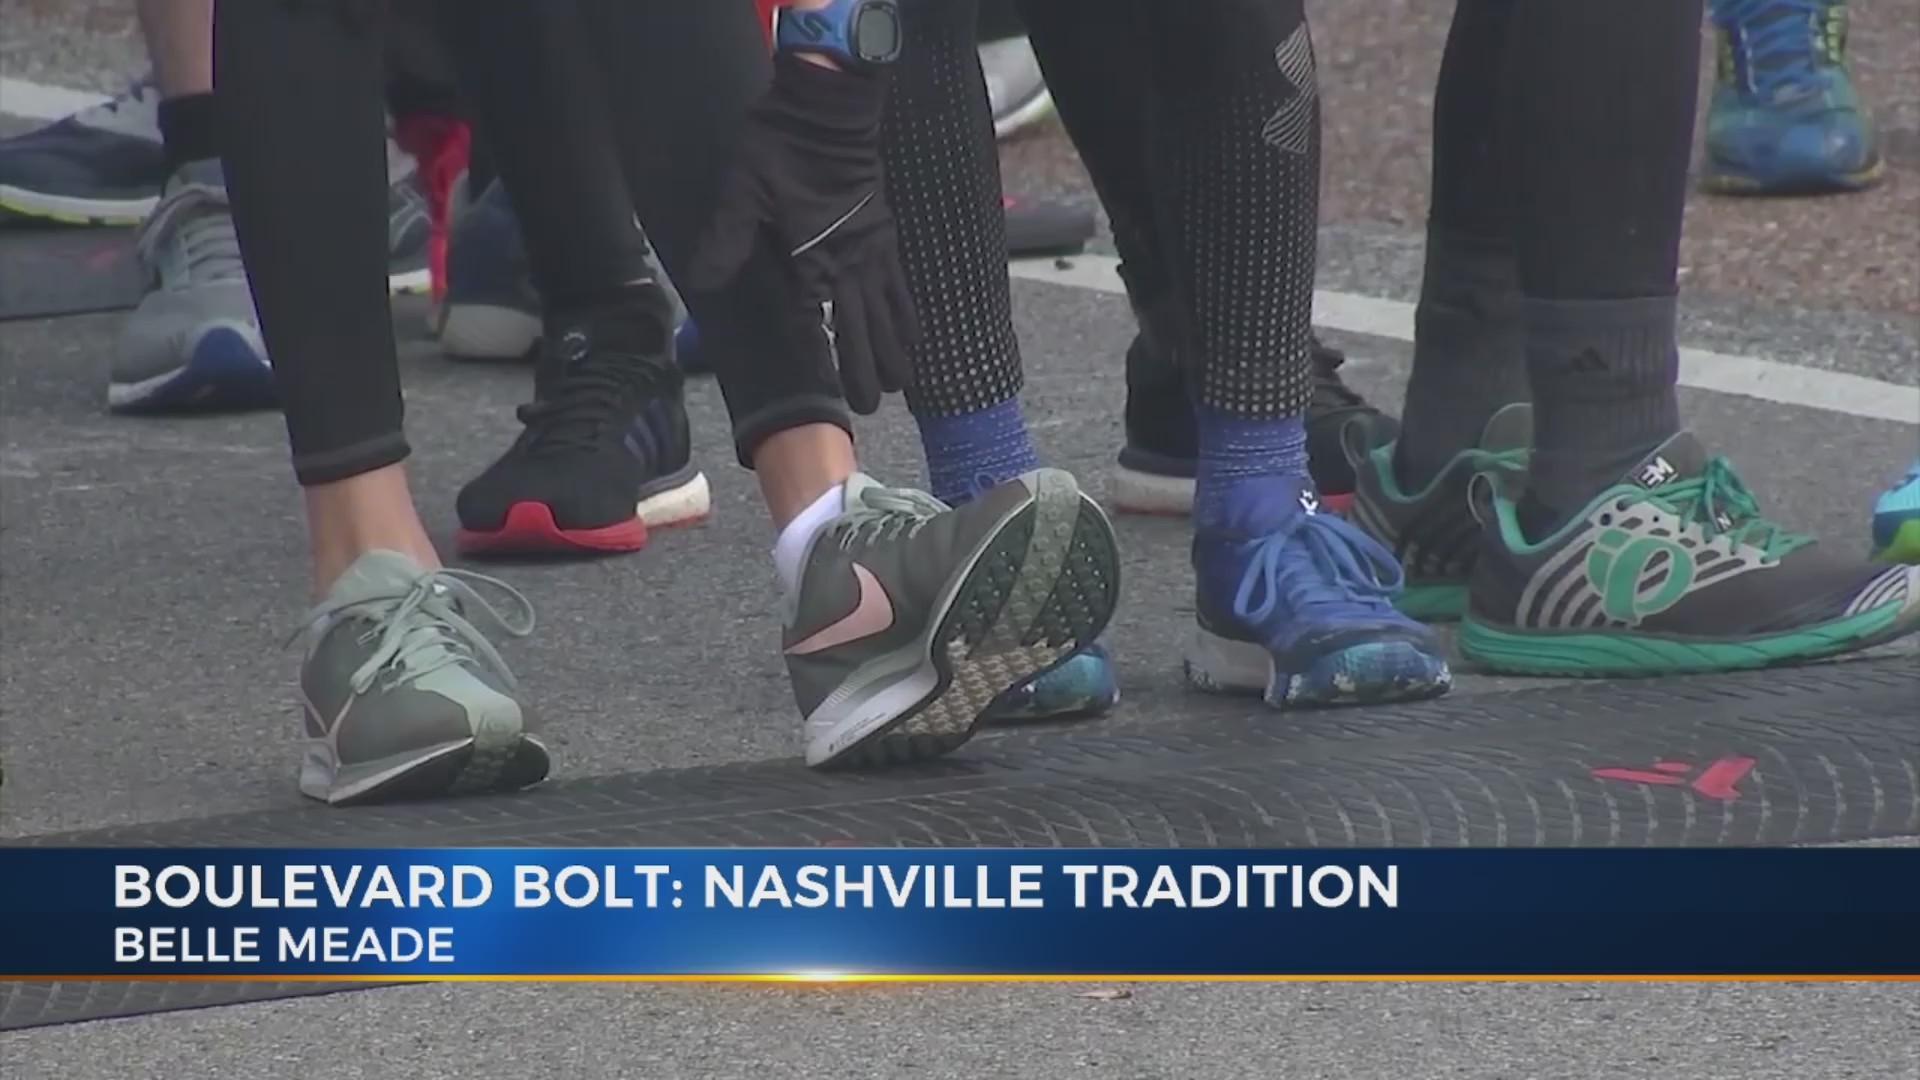 Boulevard_Bolt_benefits_Nashville_s_home_0_20181122230125